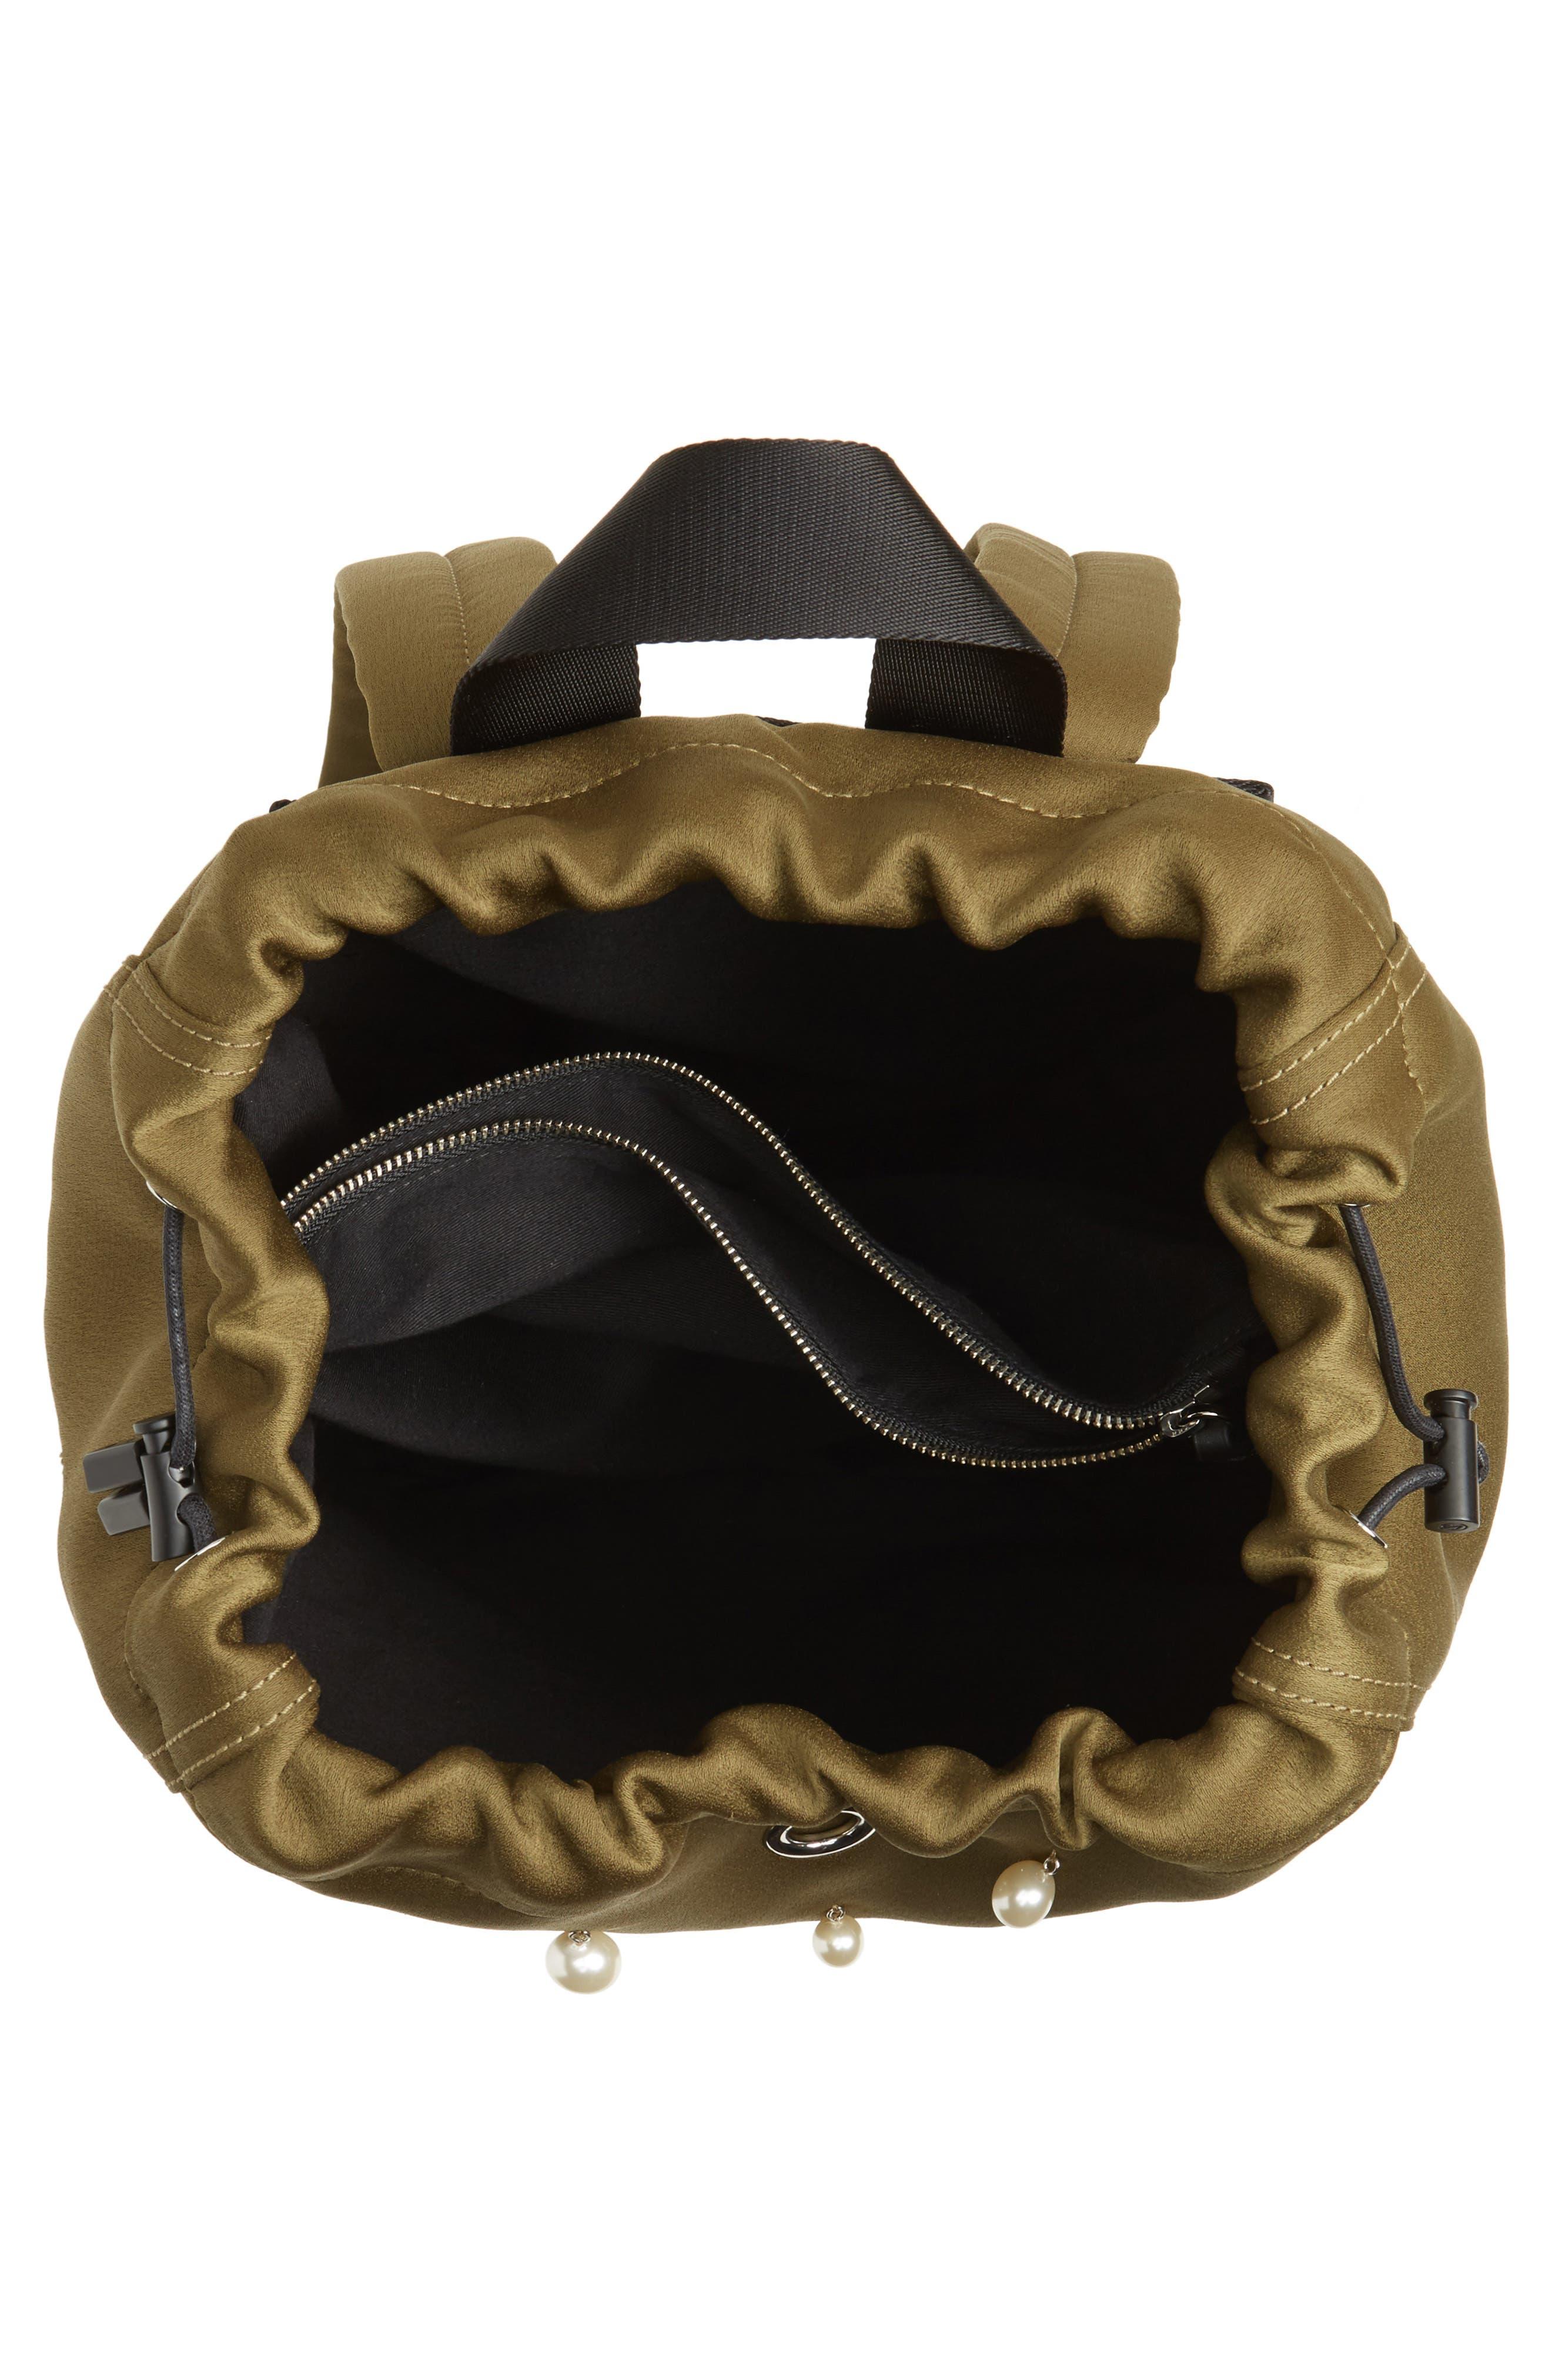 Phillip Lim 3.1 Medium Go-Go Embellished Backpack,                             Alternate thumbnail 4, color,                             Moss